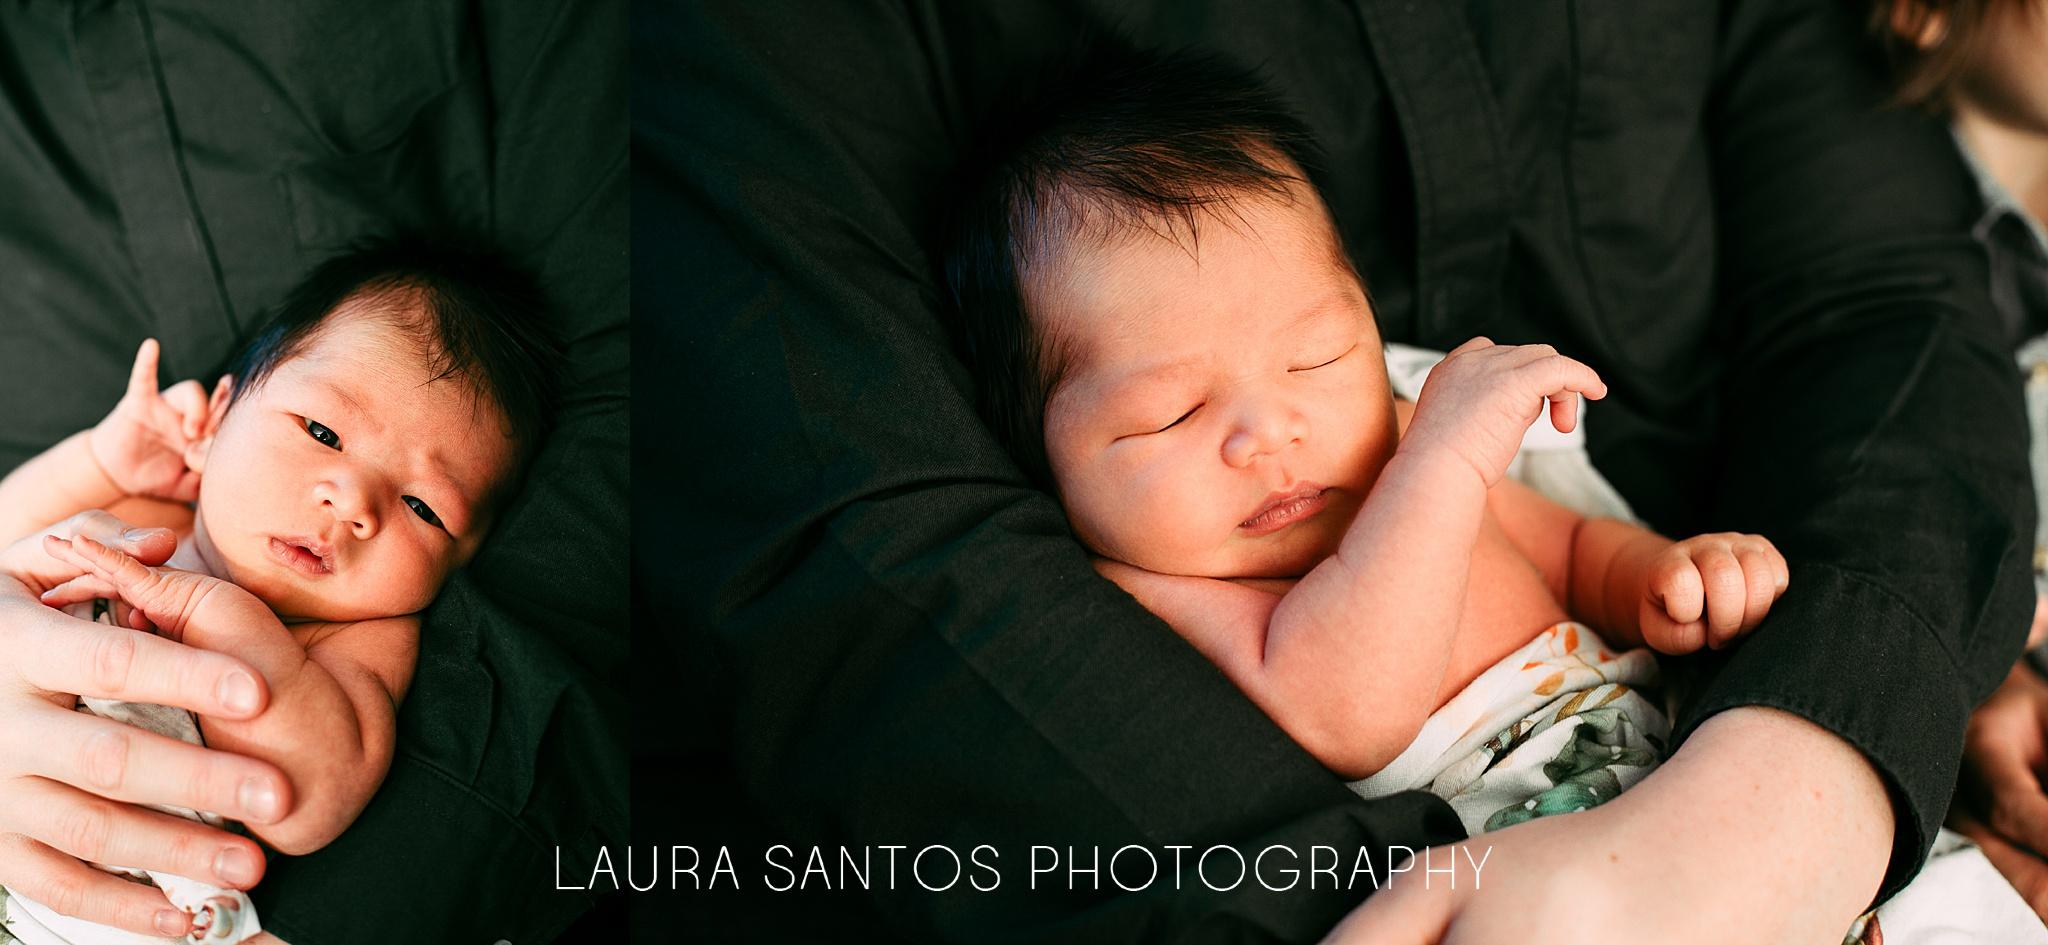 Laura Santos Photography Portland Oregon Family Photographer_0584.jpg